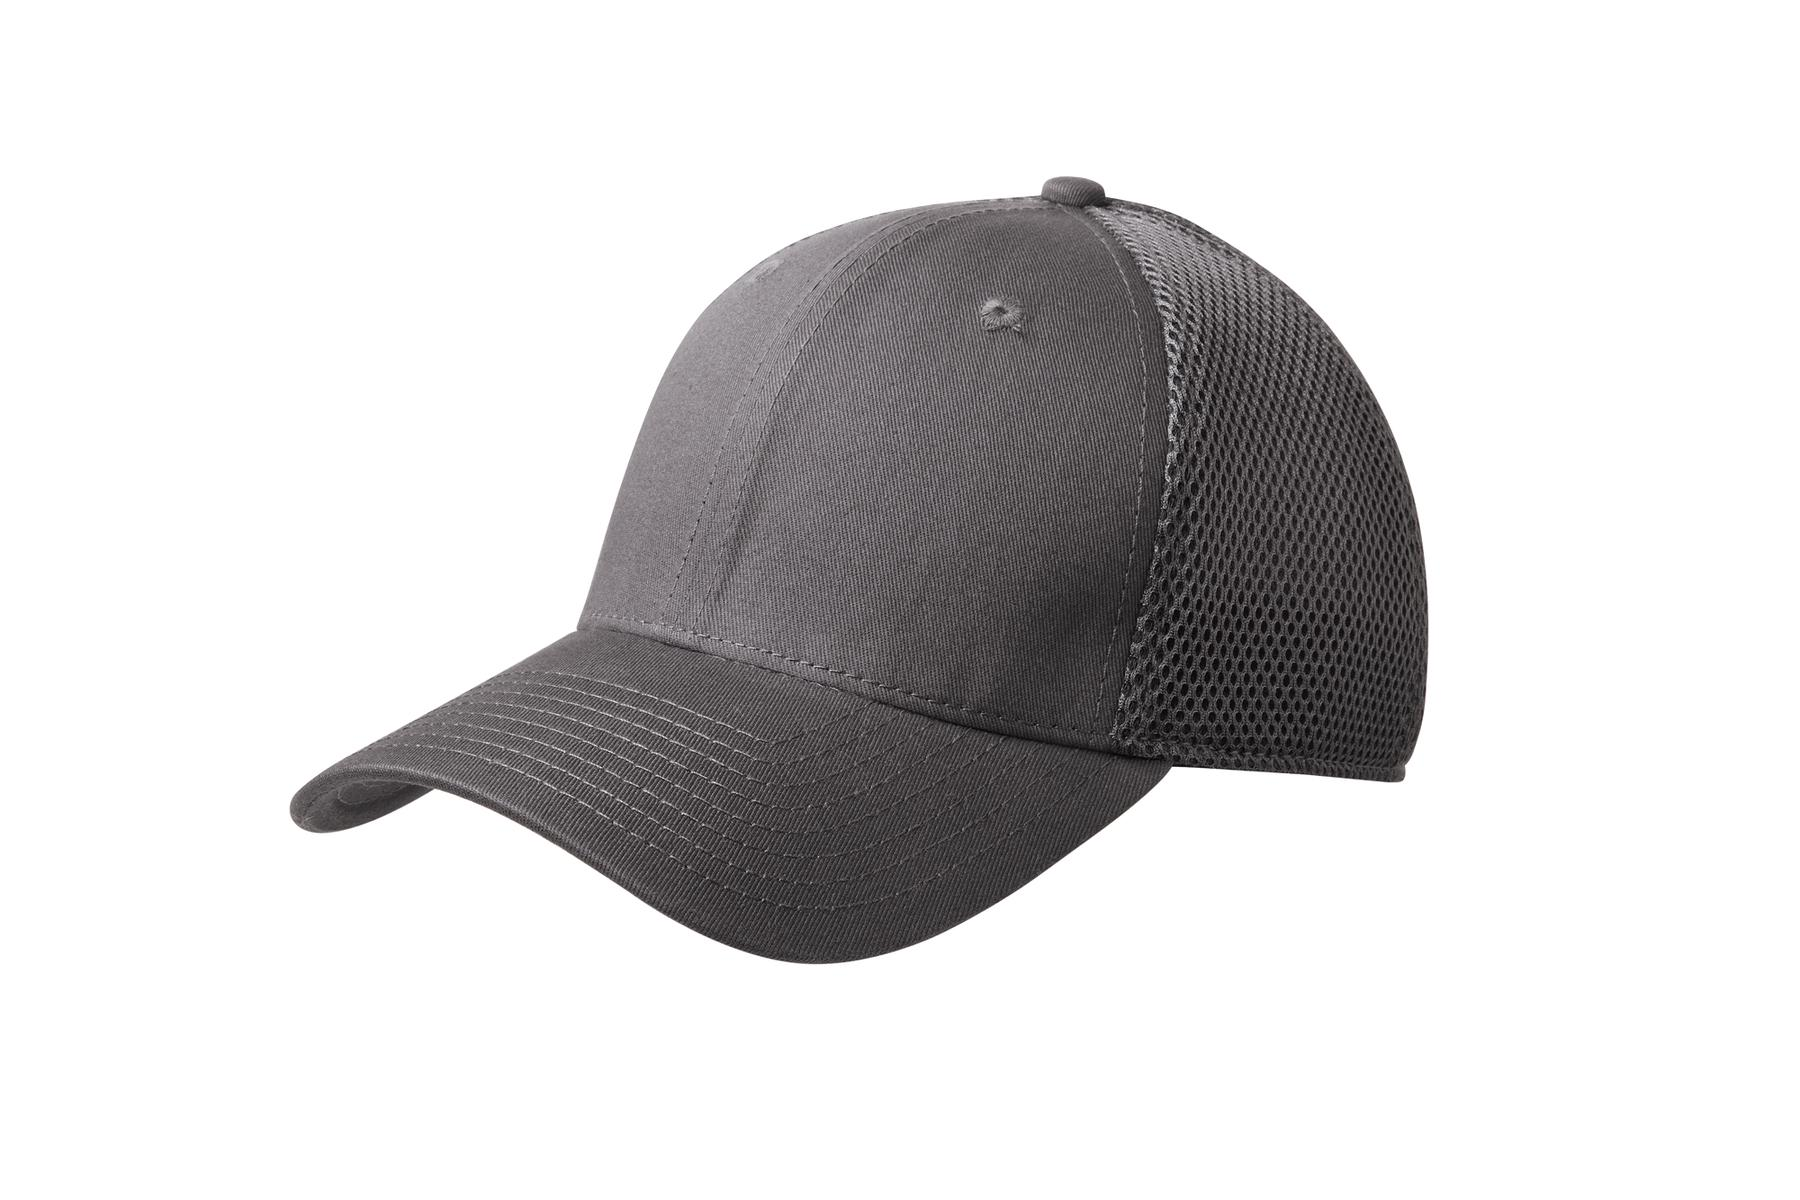 New Era Stretch Mesh Cap – UK – Kentucky Uniforms 4ebc7642a40